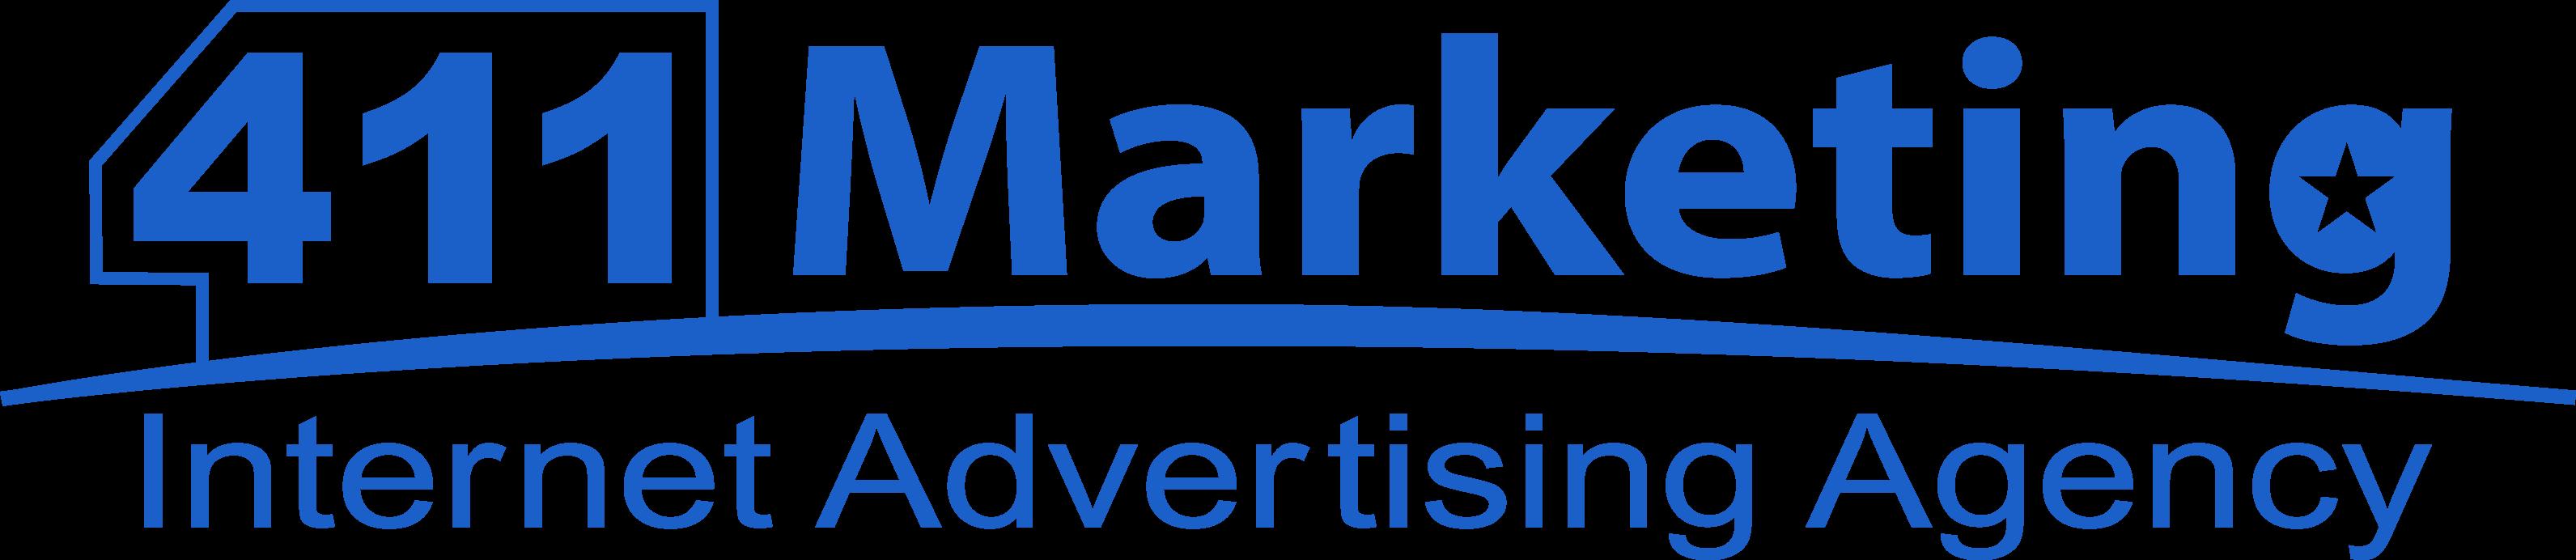 411 marketing logo